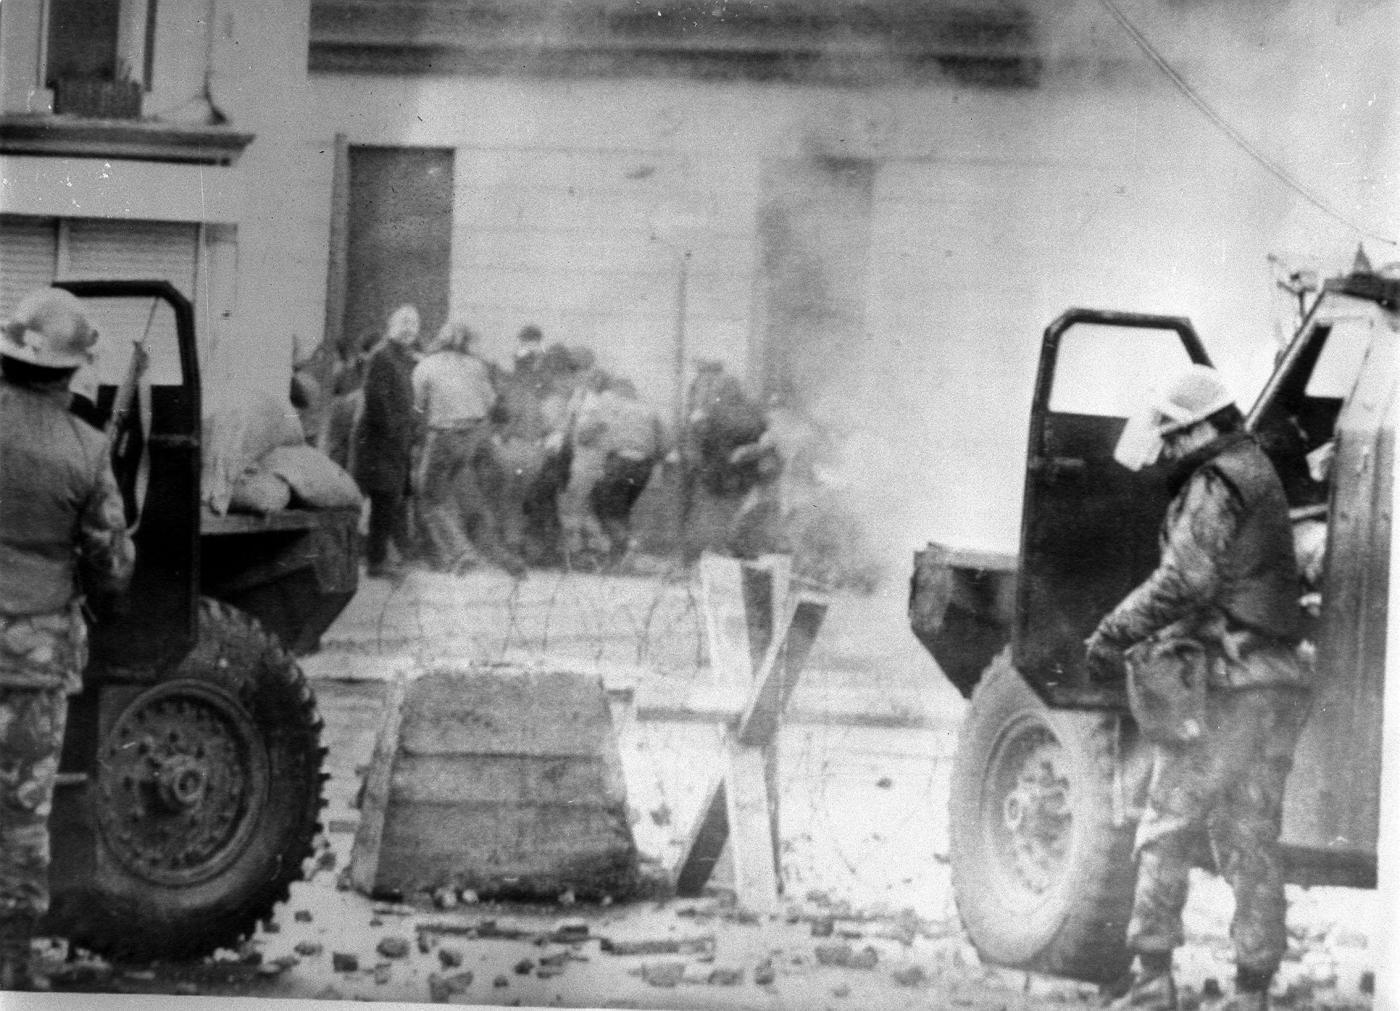 Bloody Sunday, l'innocenza massacrata nelle strade irlandesi